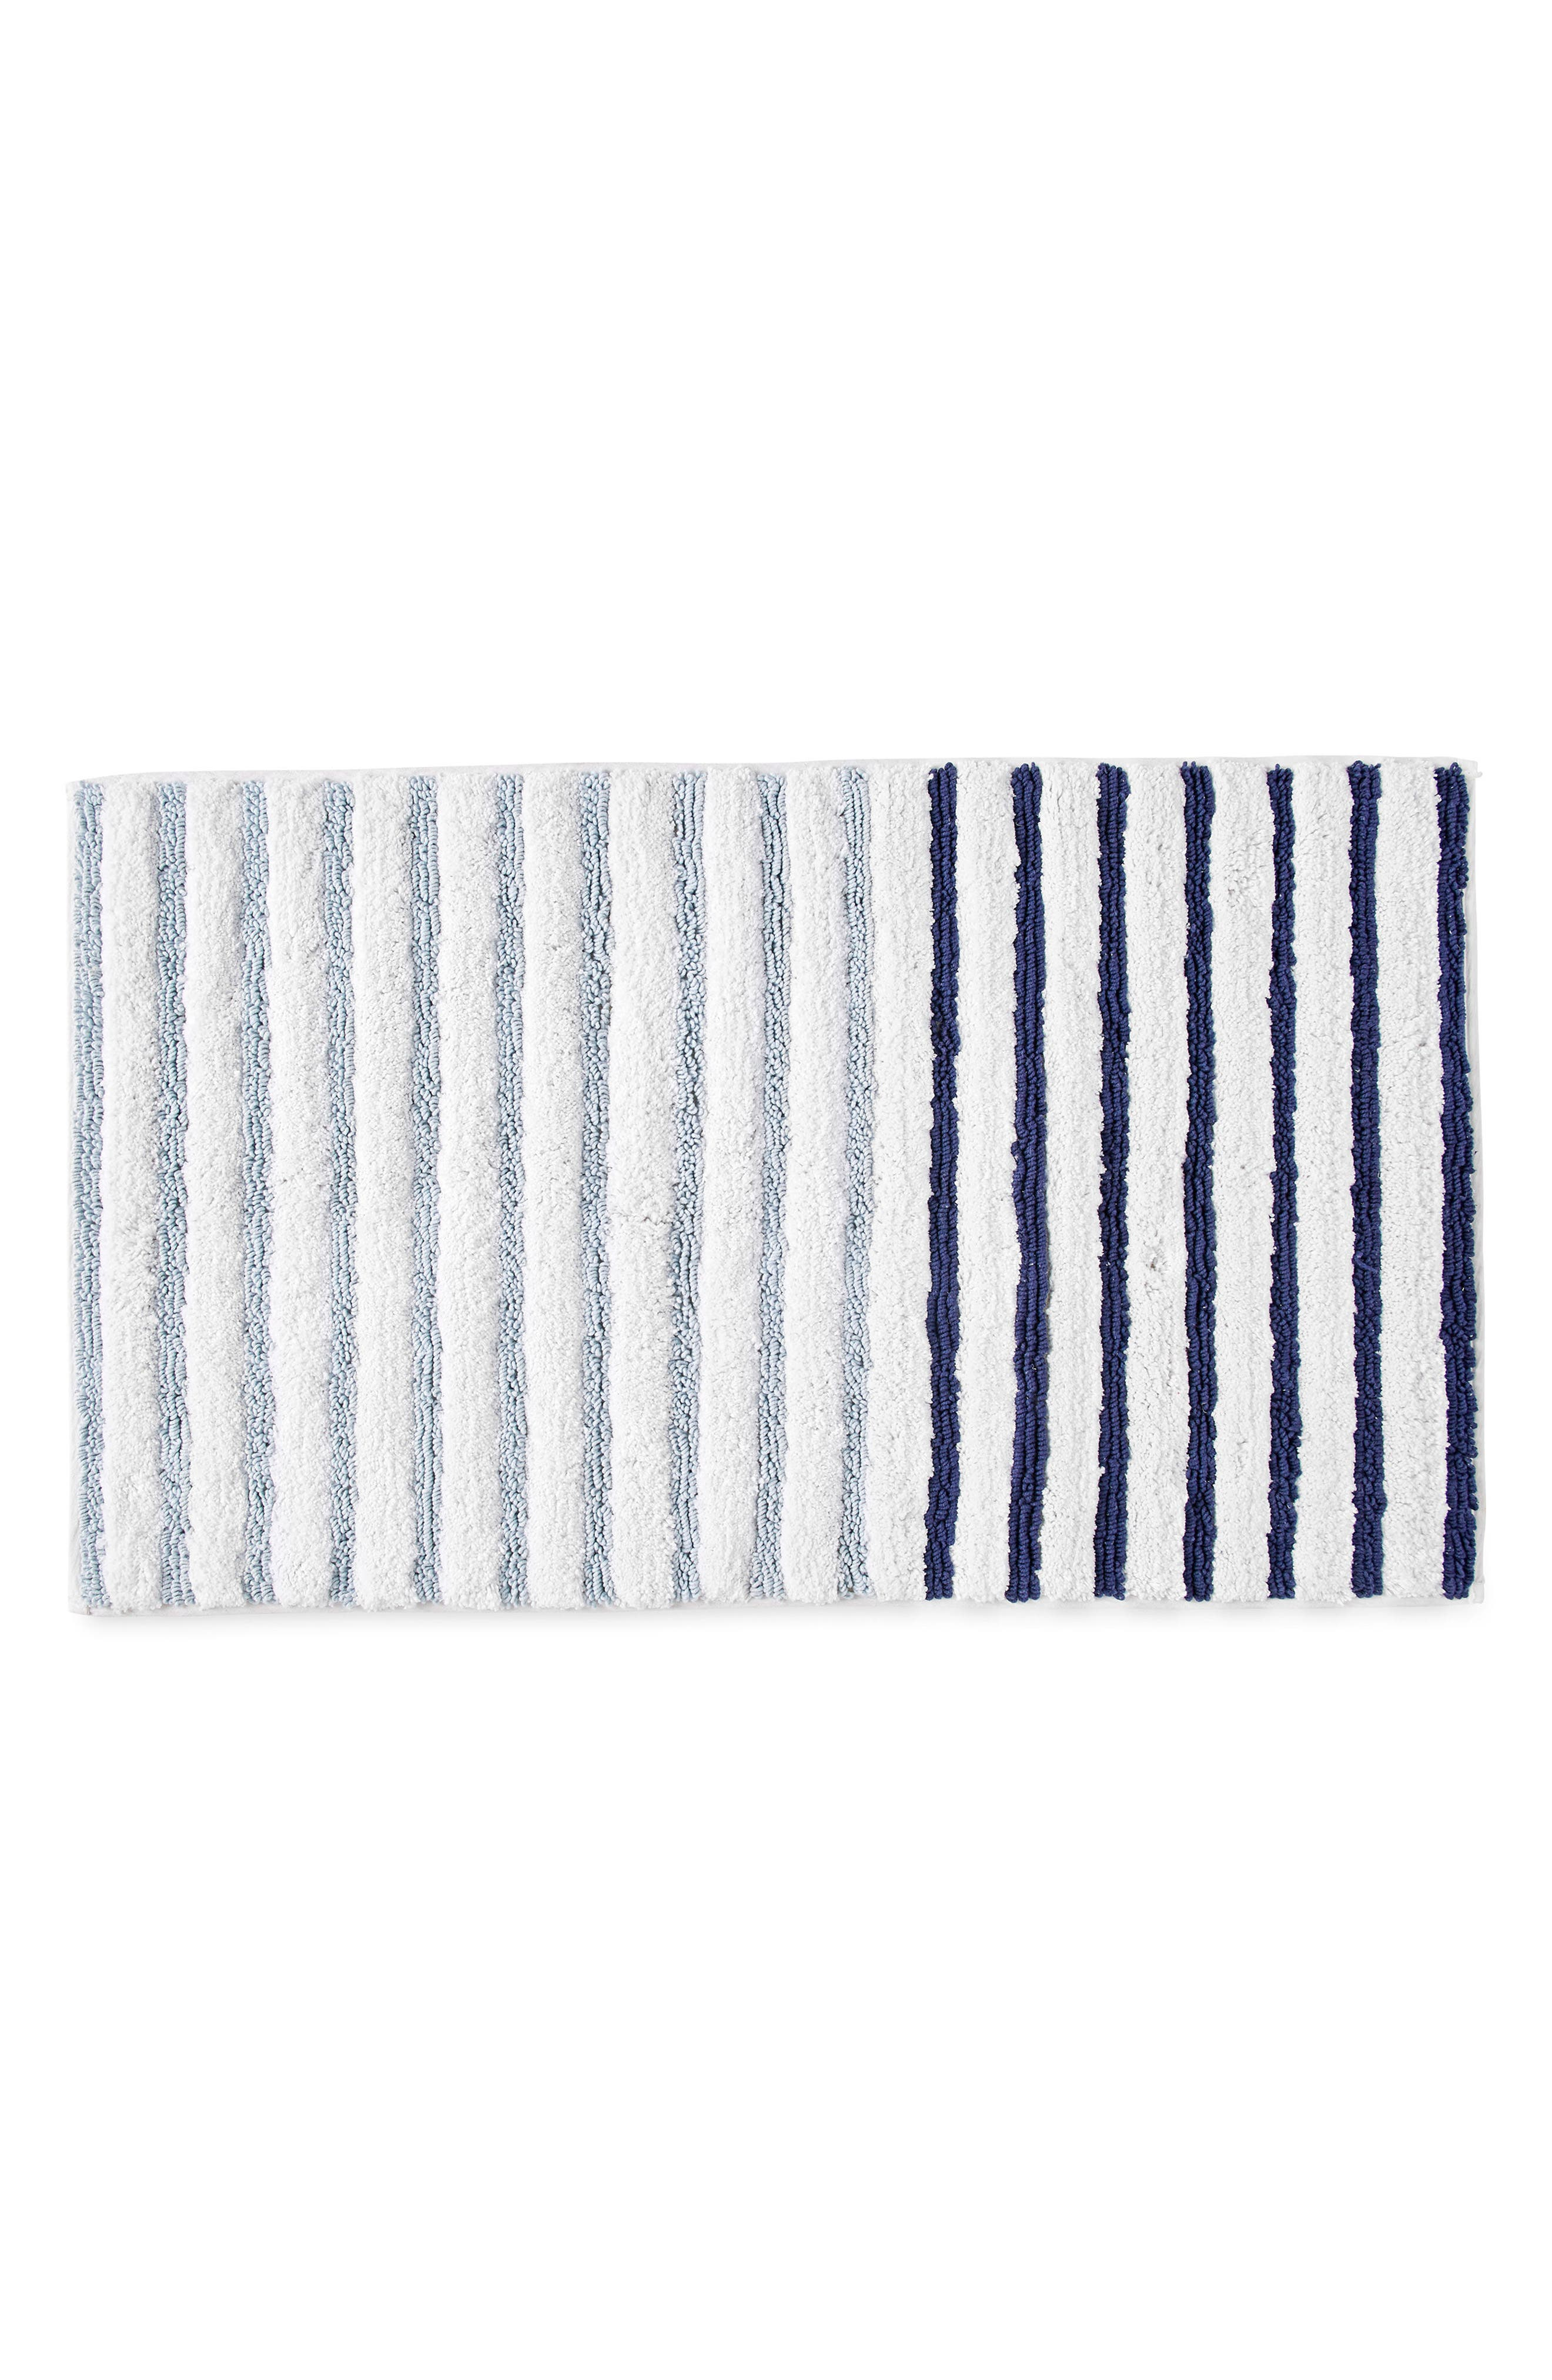 DKNY Stripe Tip Towel